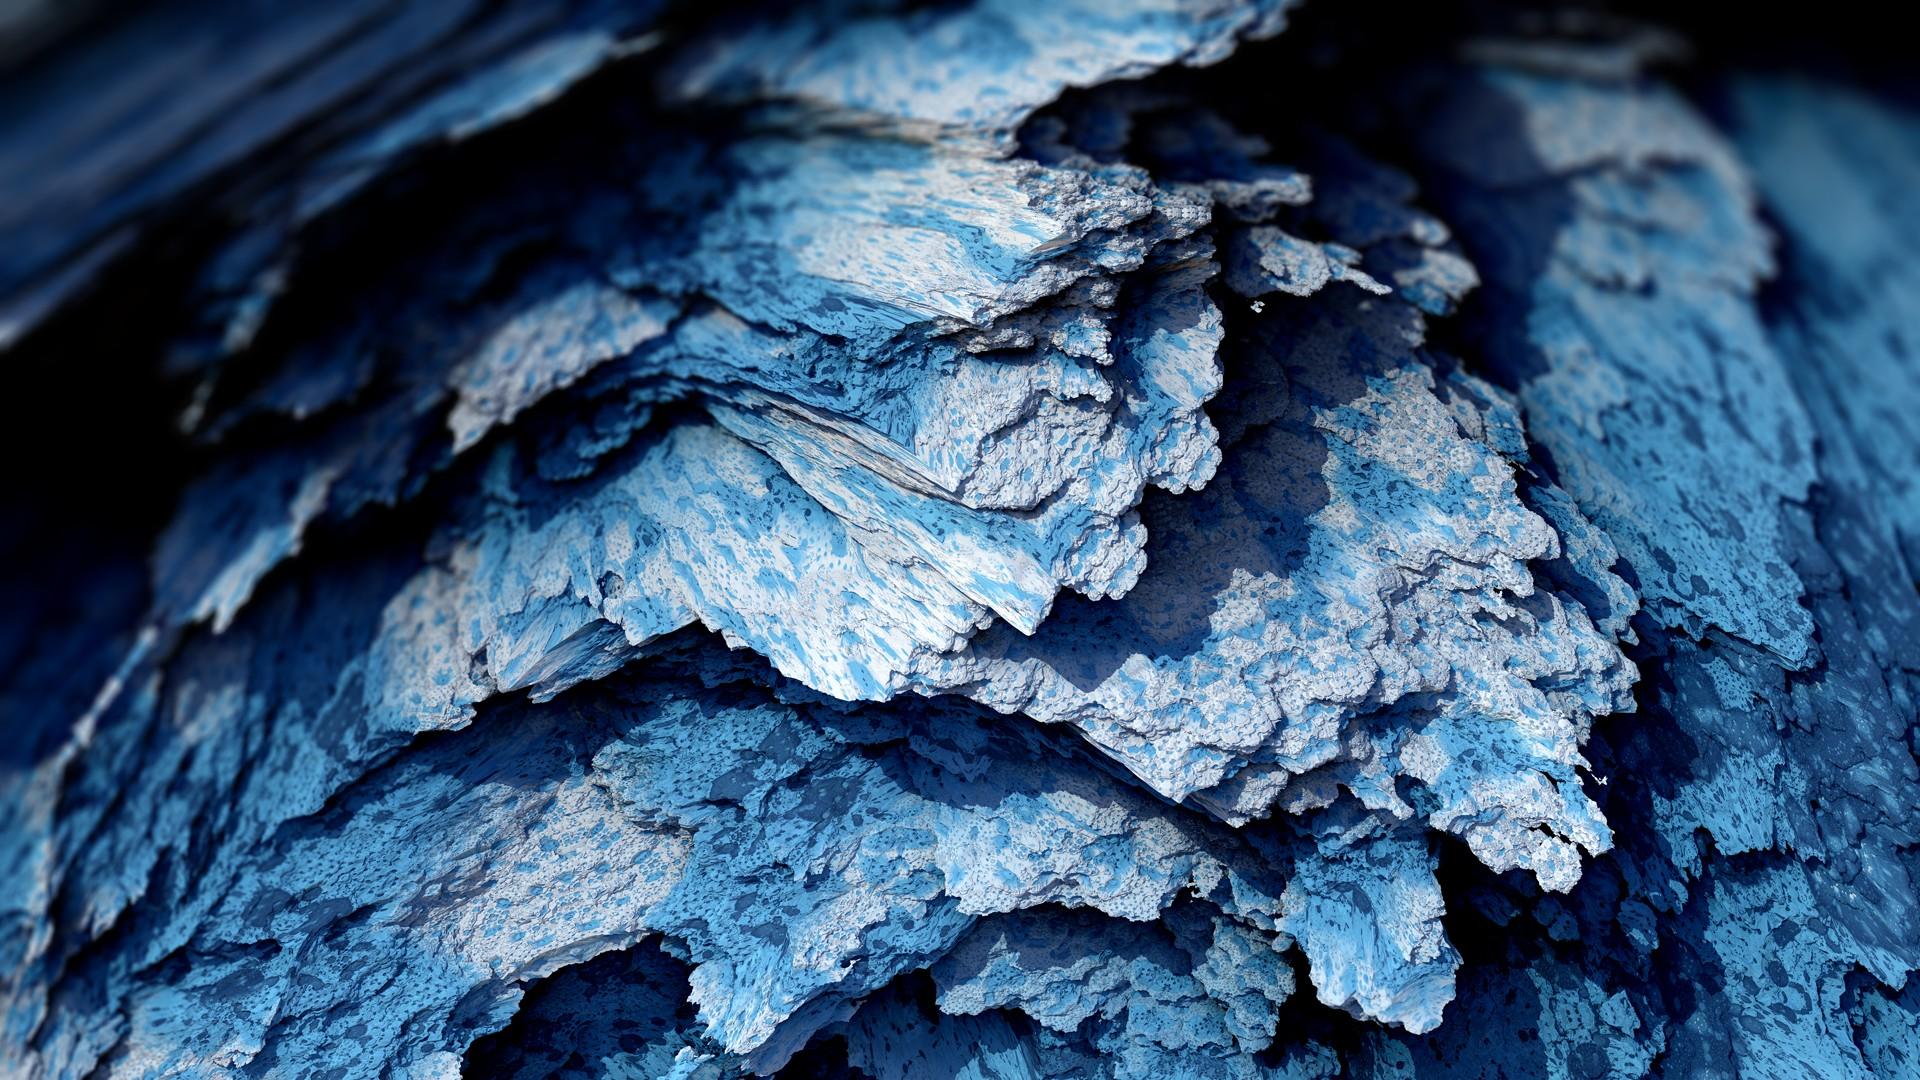 General 1920x1080 Procedural Minerals mineral blue abstract artwork CGI digital art